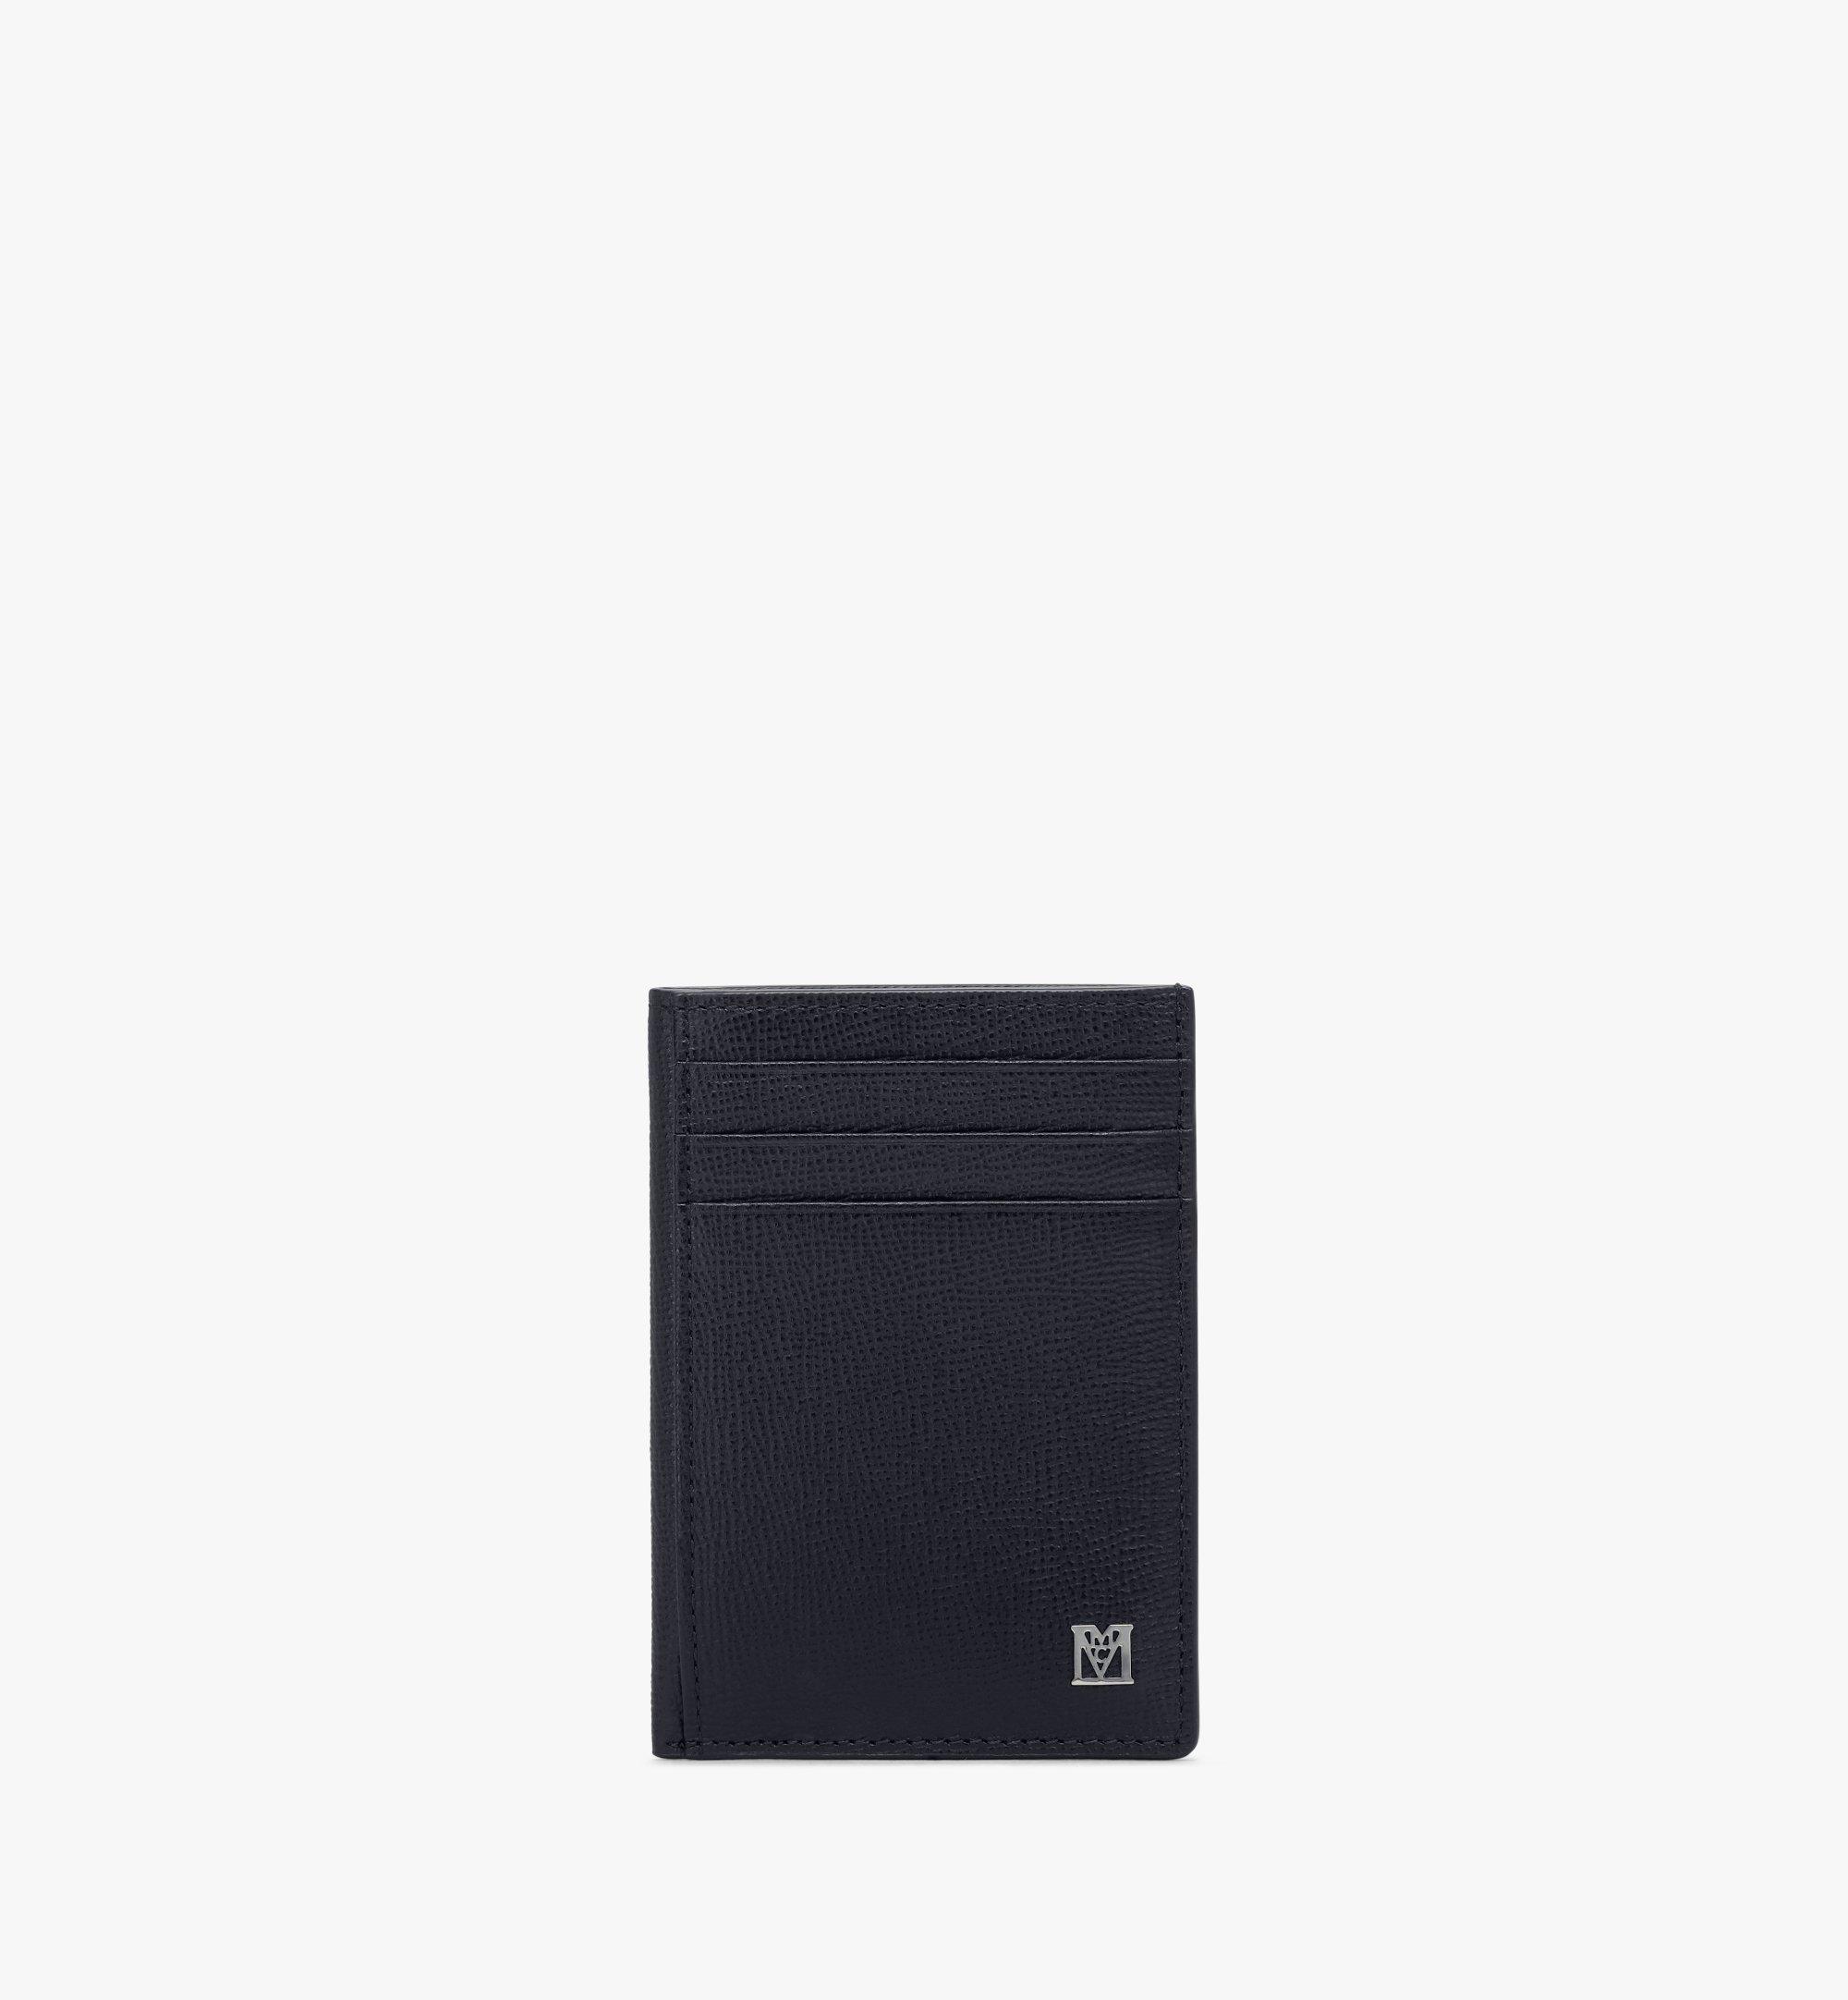 MCM Mena N/S Card Case Black MXAAALM03BK001 Alternate View 1